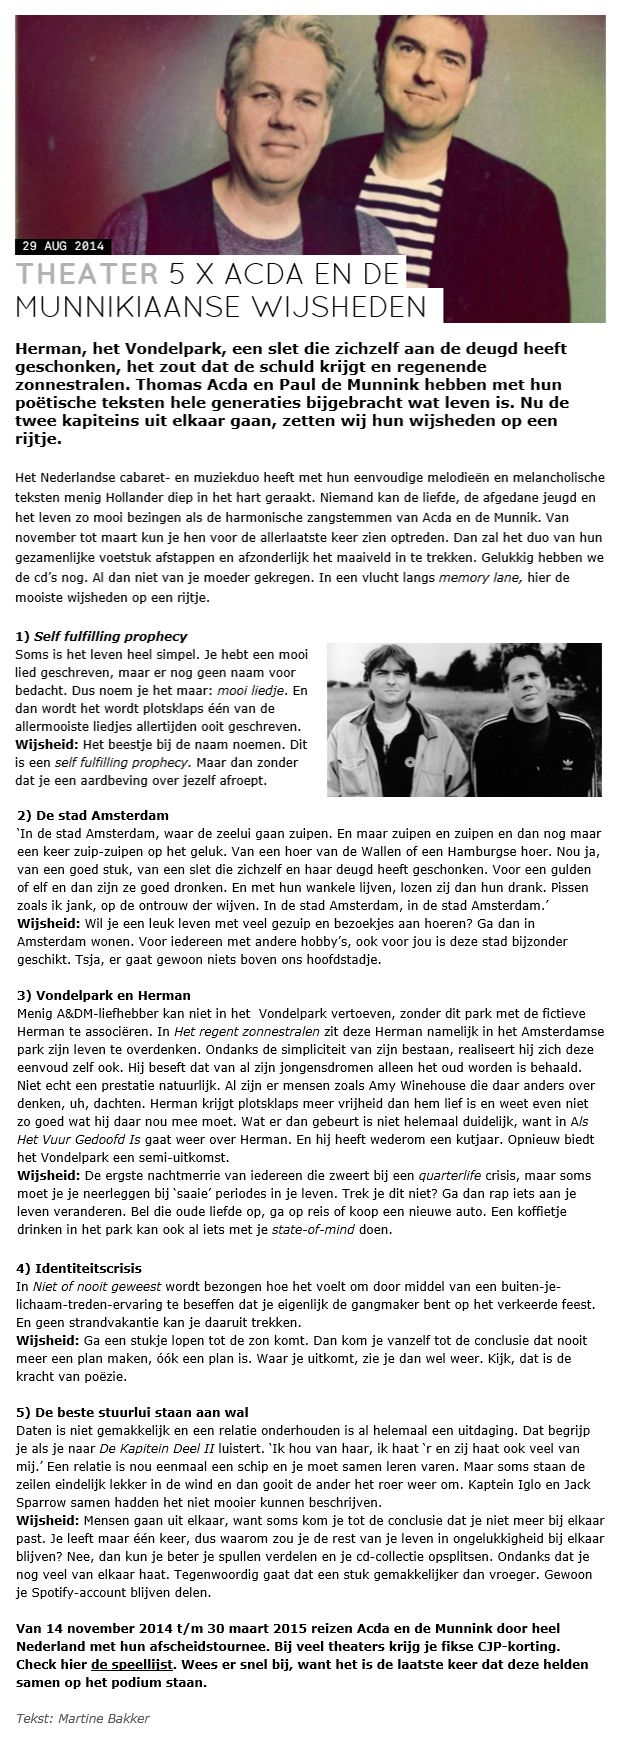 Acda en De Munnik. © 2014 CJP, Martine Bakker.